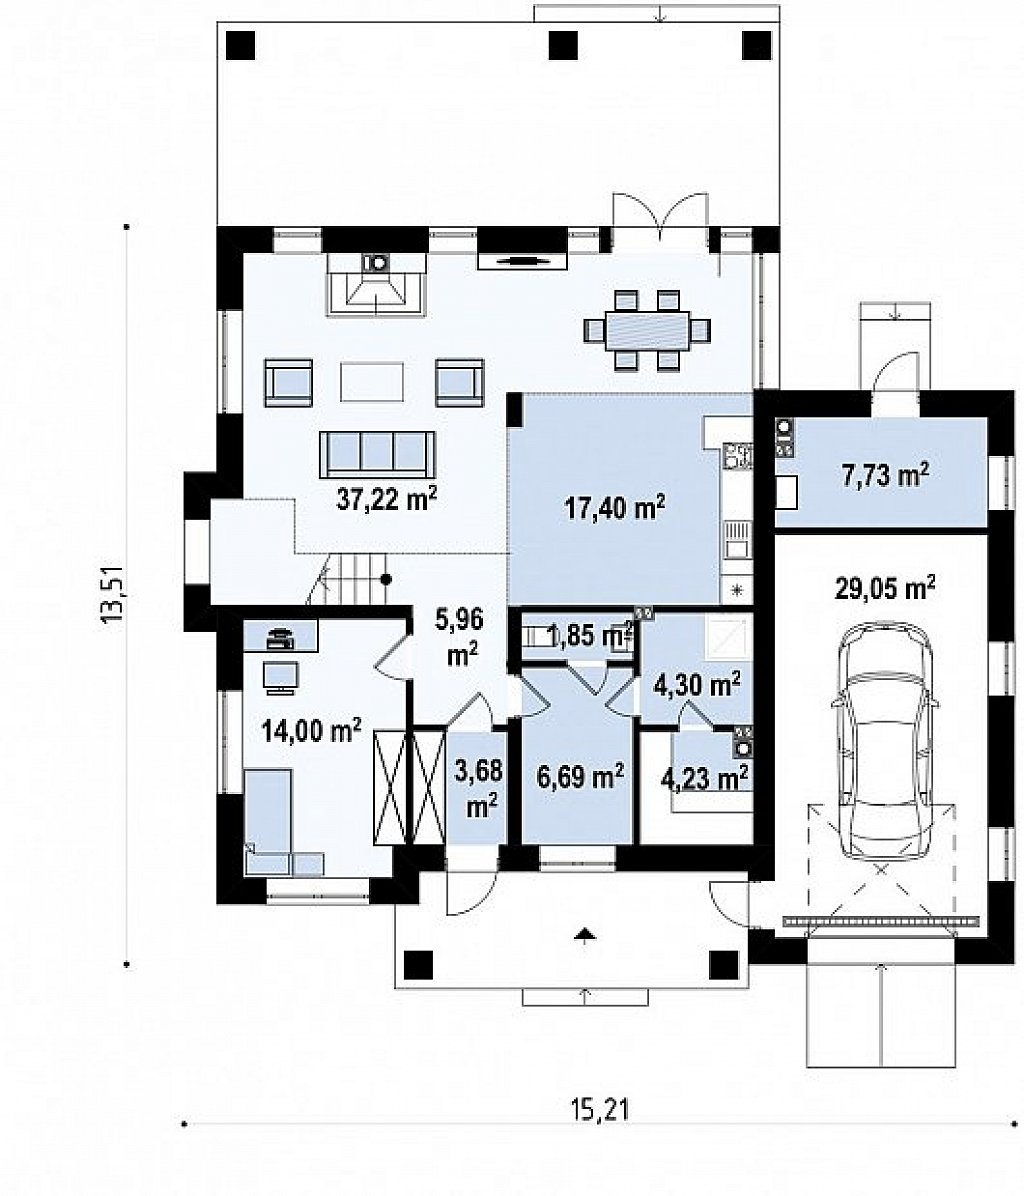 Вариант проекта Zz2 L + с плитами перекрытия план помещений 1